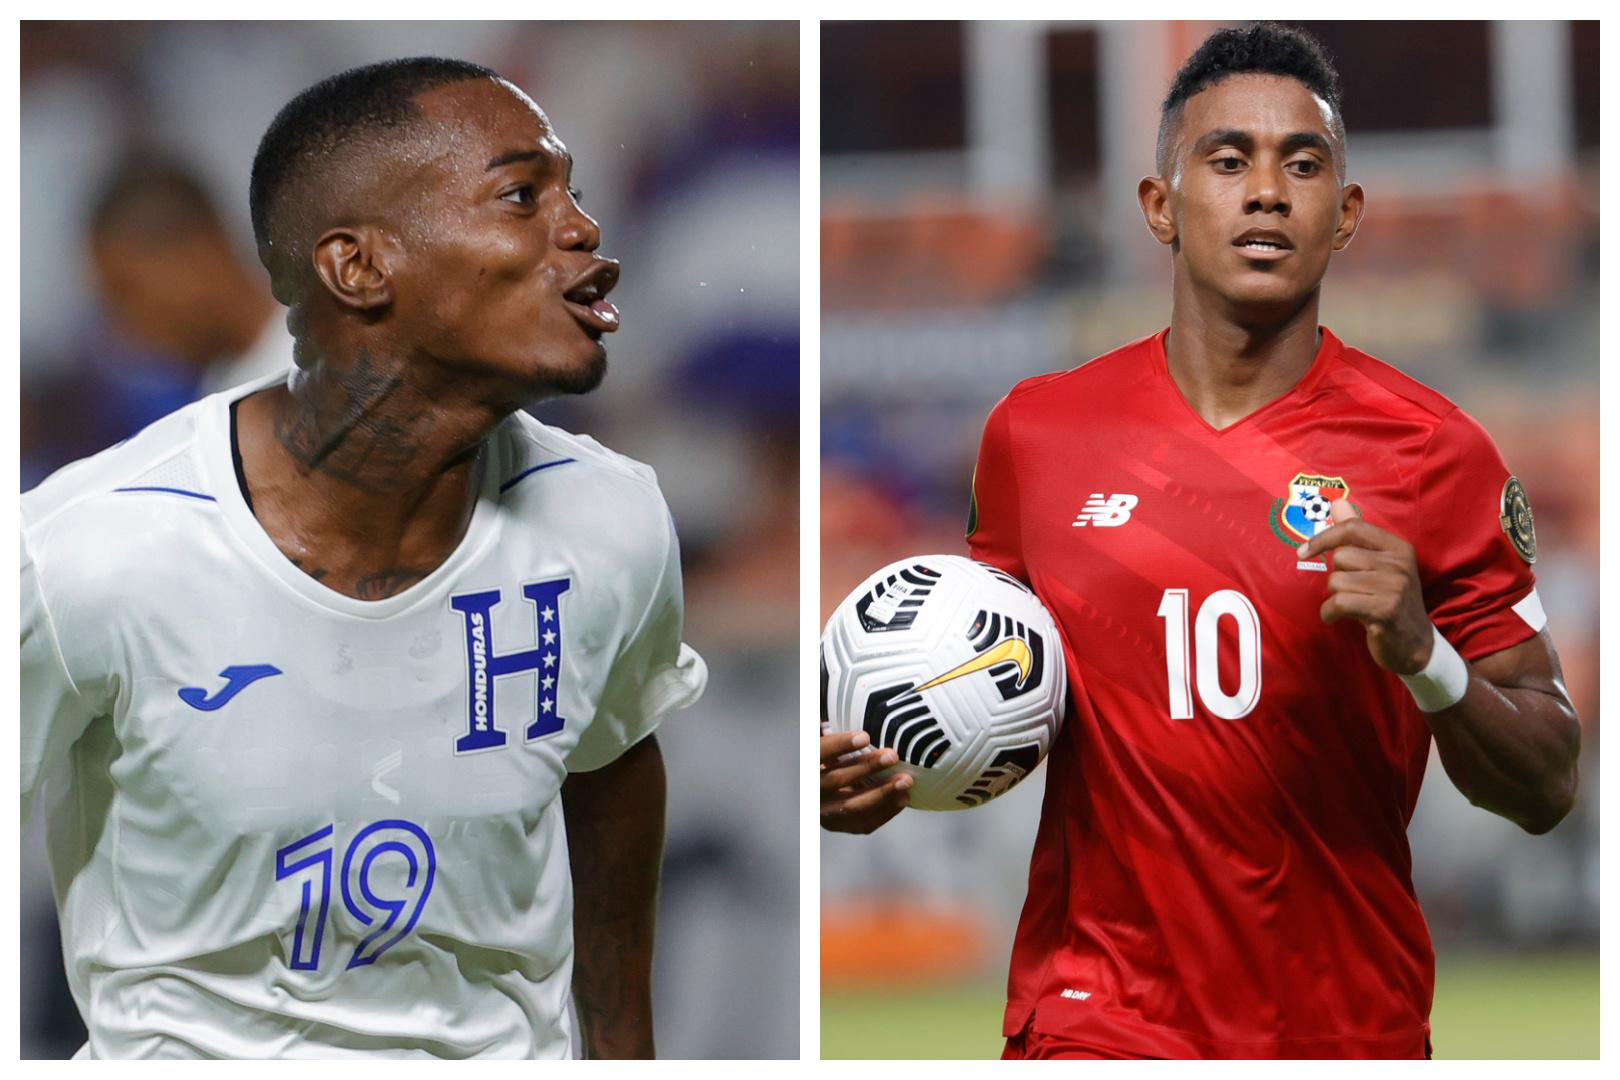 Panama, Honduras meet with Group D top spot on the line